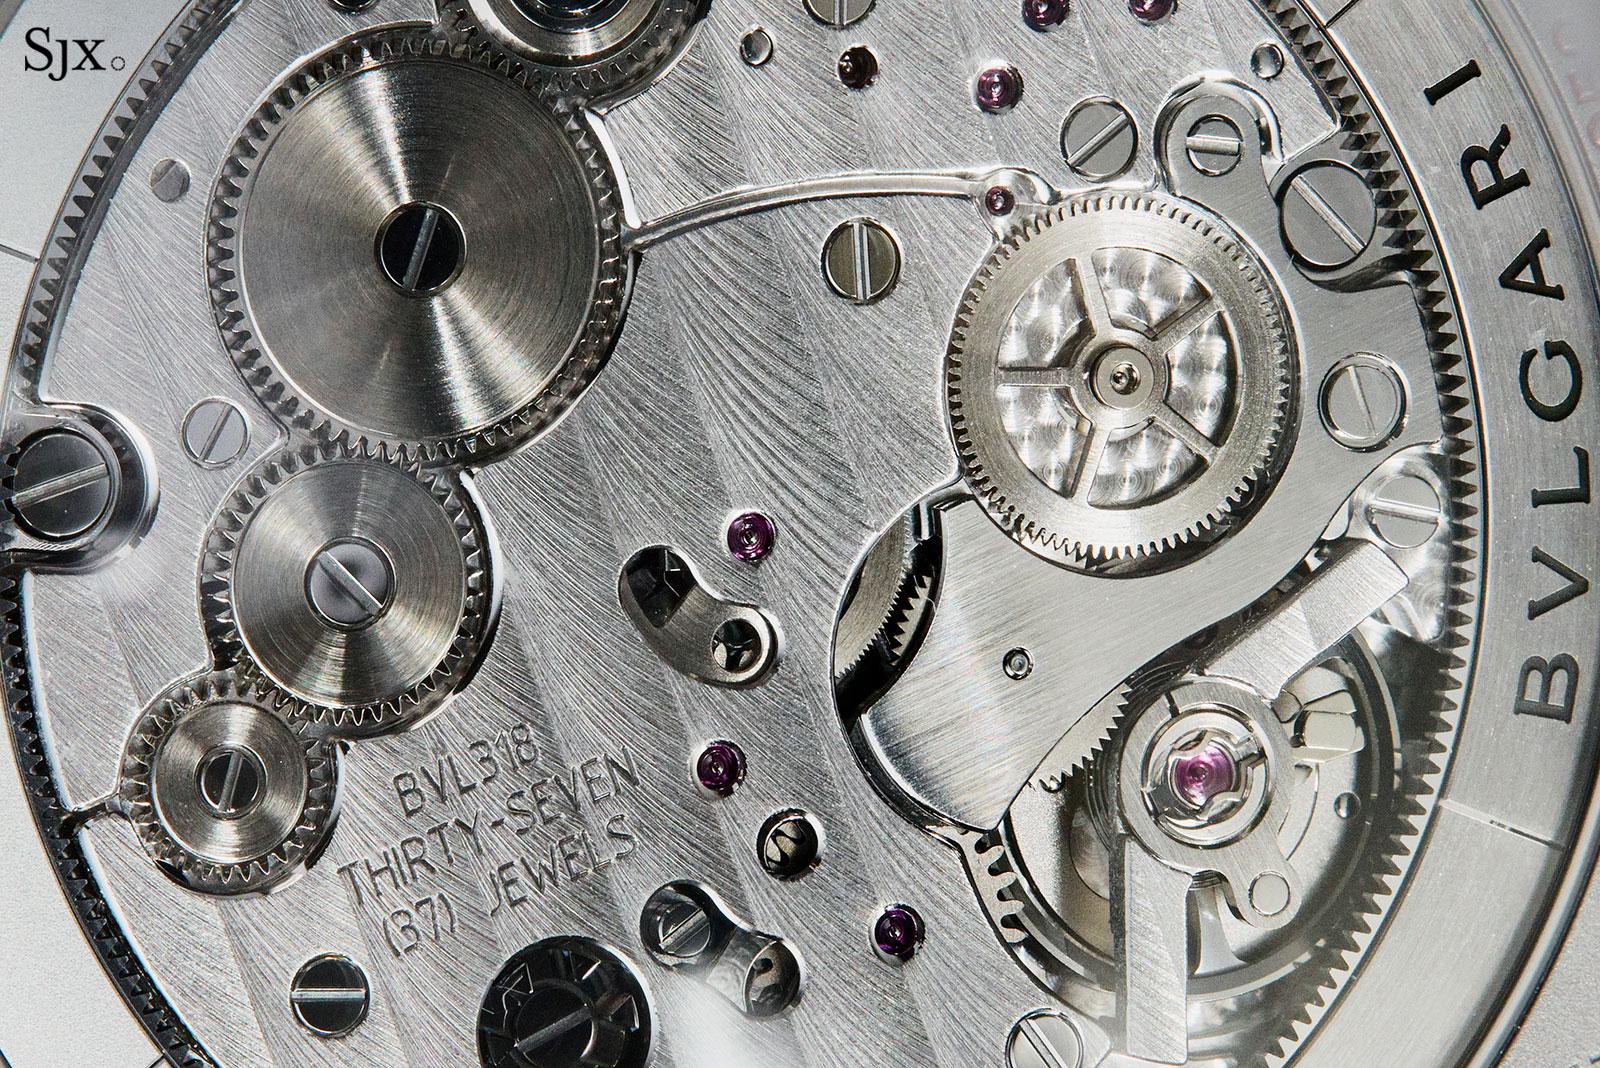 Bulgari Octo Finissimo Chronograph GMT Automatic 8